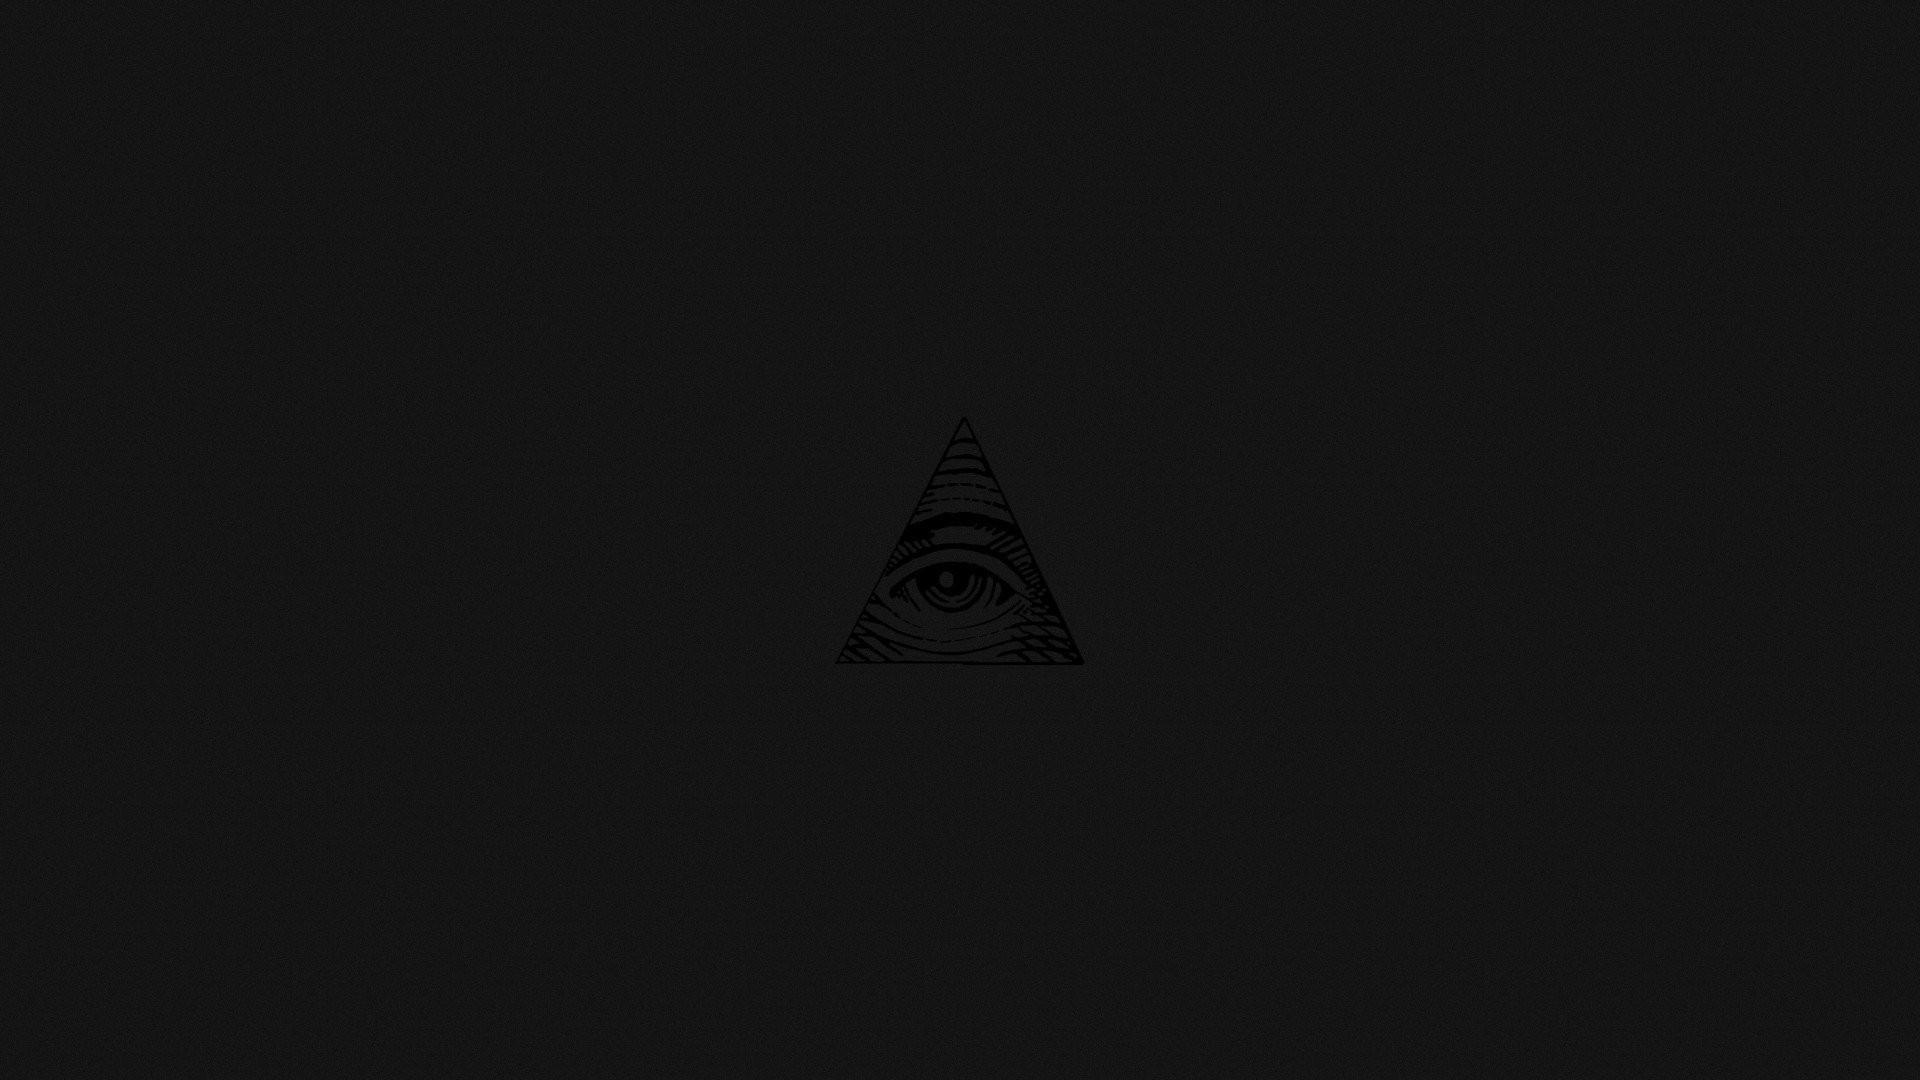 Gravity Falls Wallpaper Full Hd Illuminati Wallpapers 74 Pictures